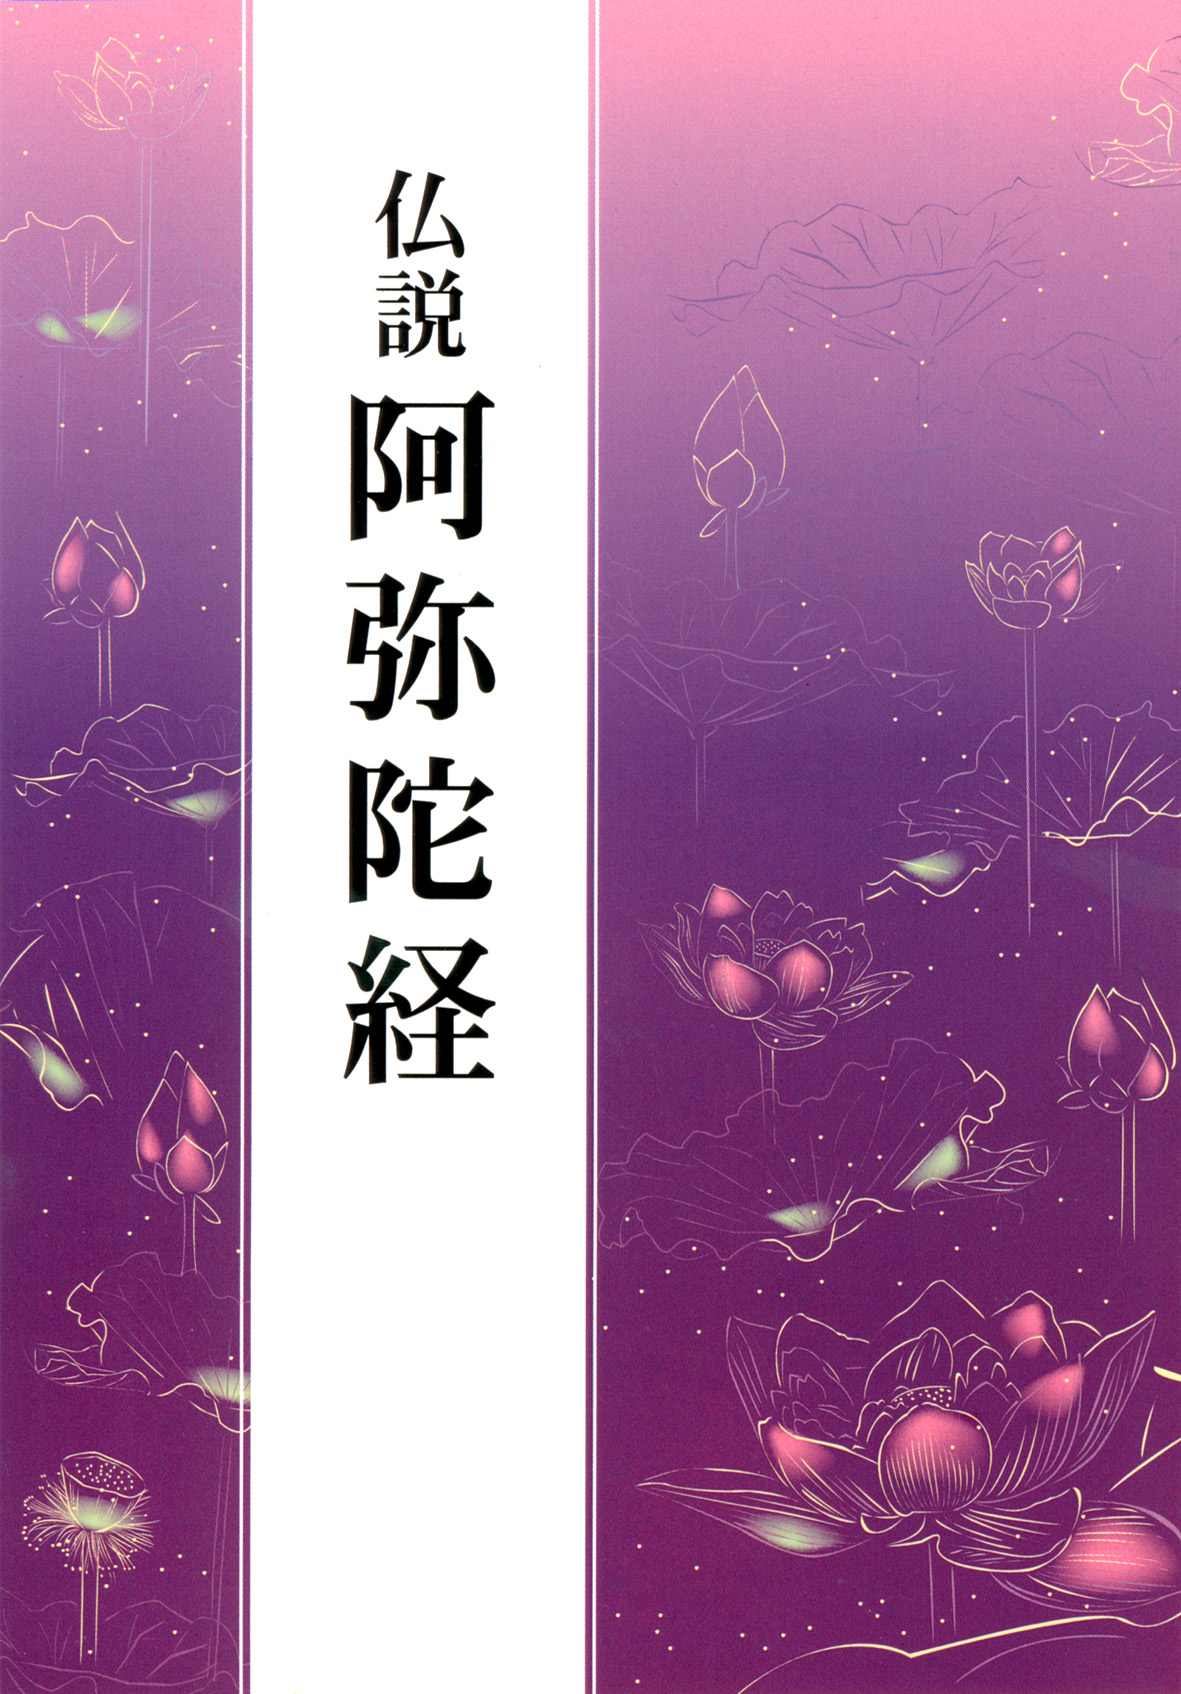 仏説阿弥陀経(経本)浄土真宗の家庭に必携の経典